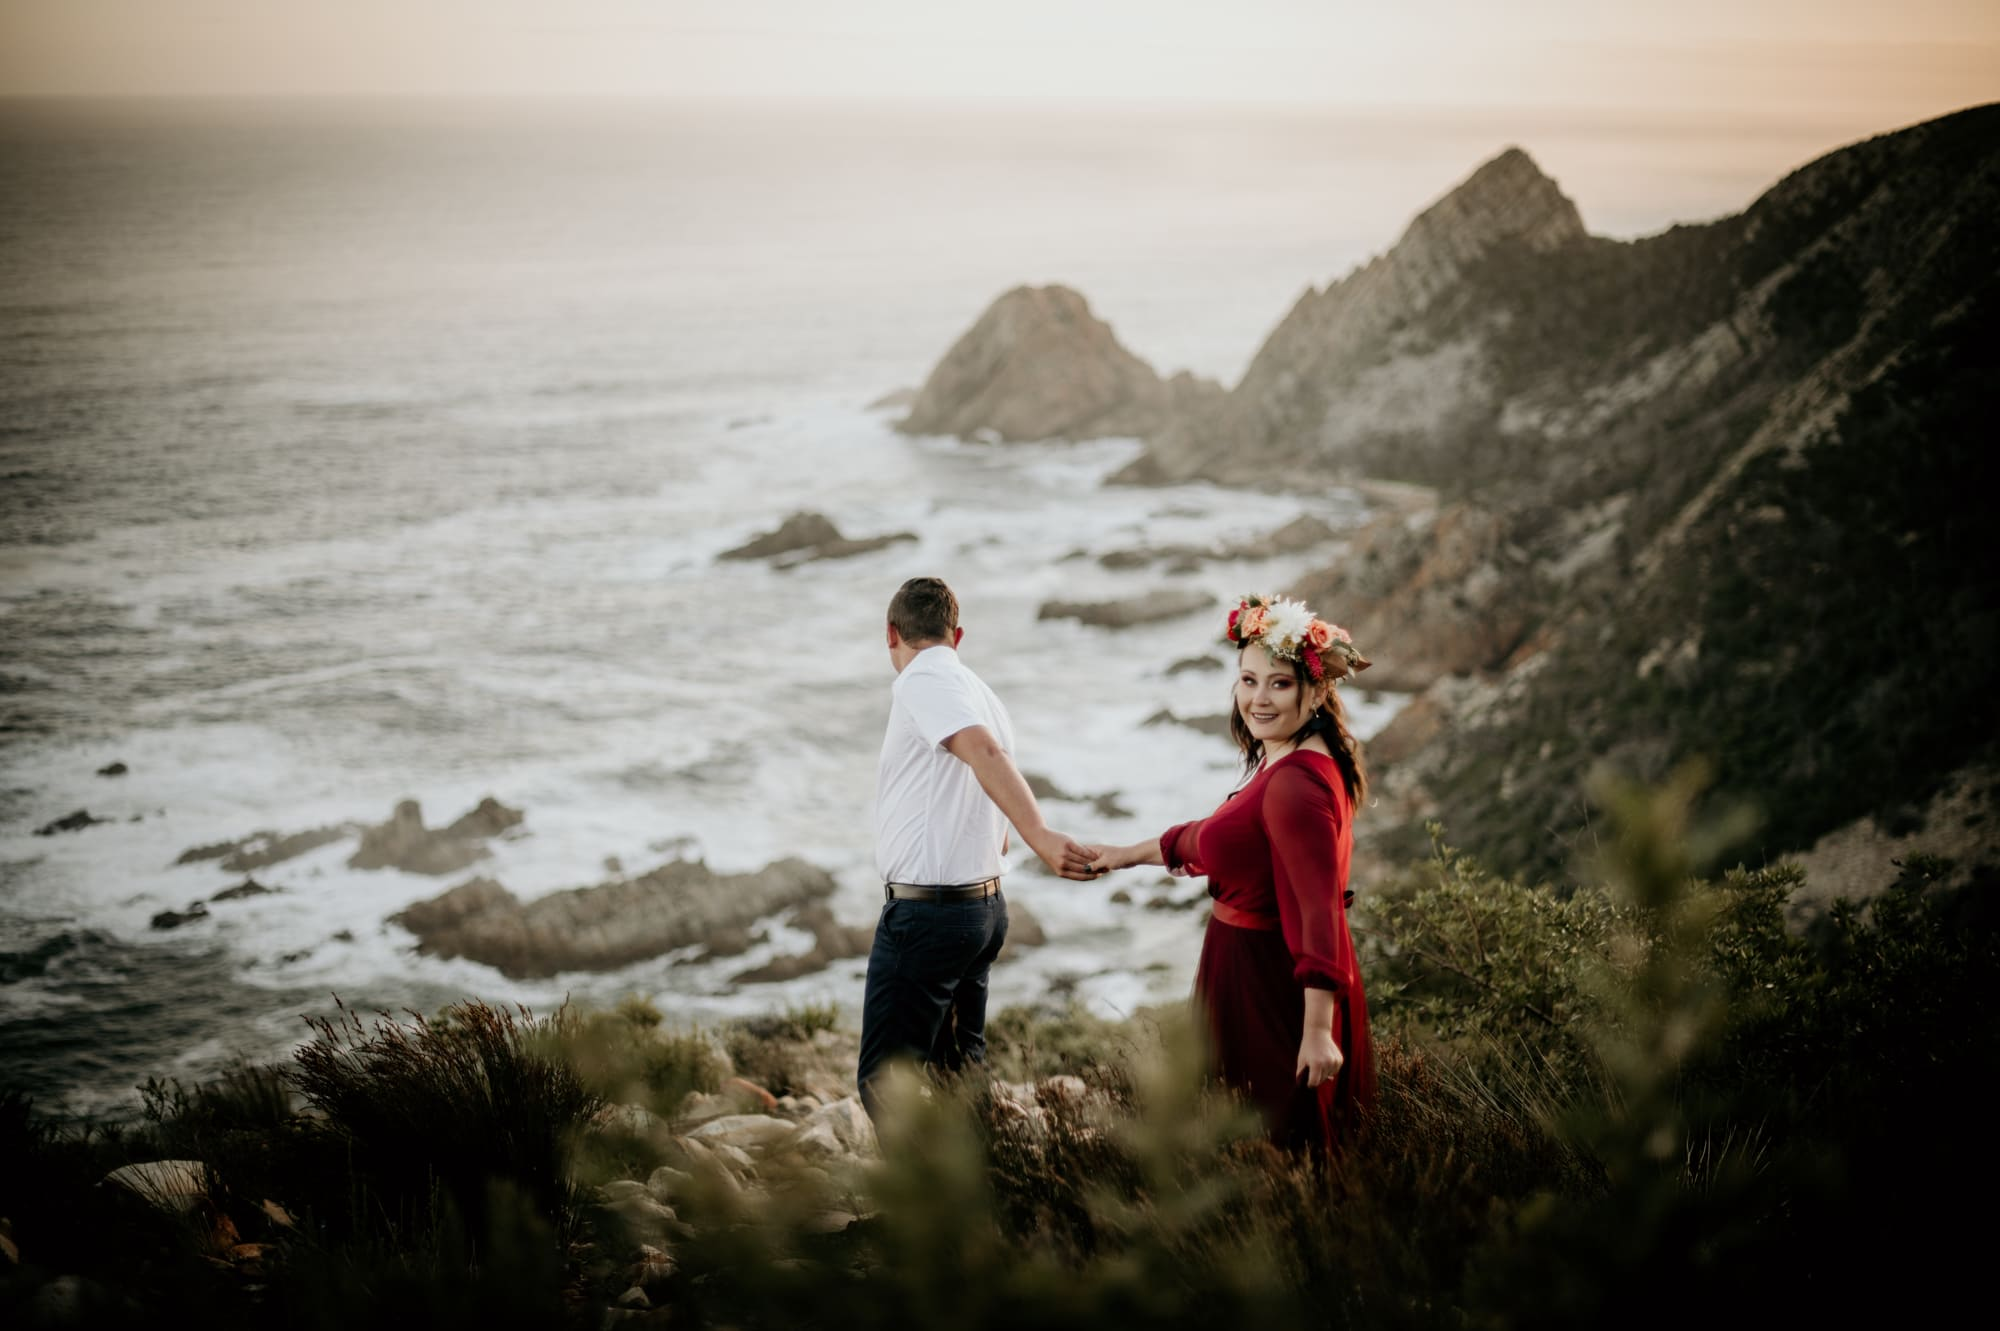 jesann-freddie-kranshoek-engagement-June-Richards-Photography-Destination-Weddings-Elopements-Garden-Route-36